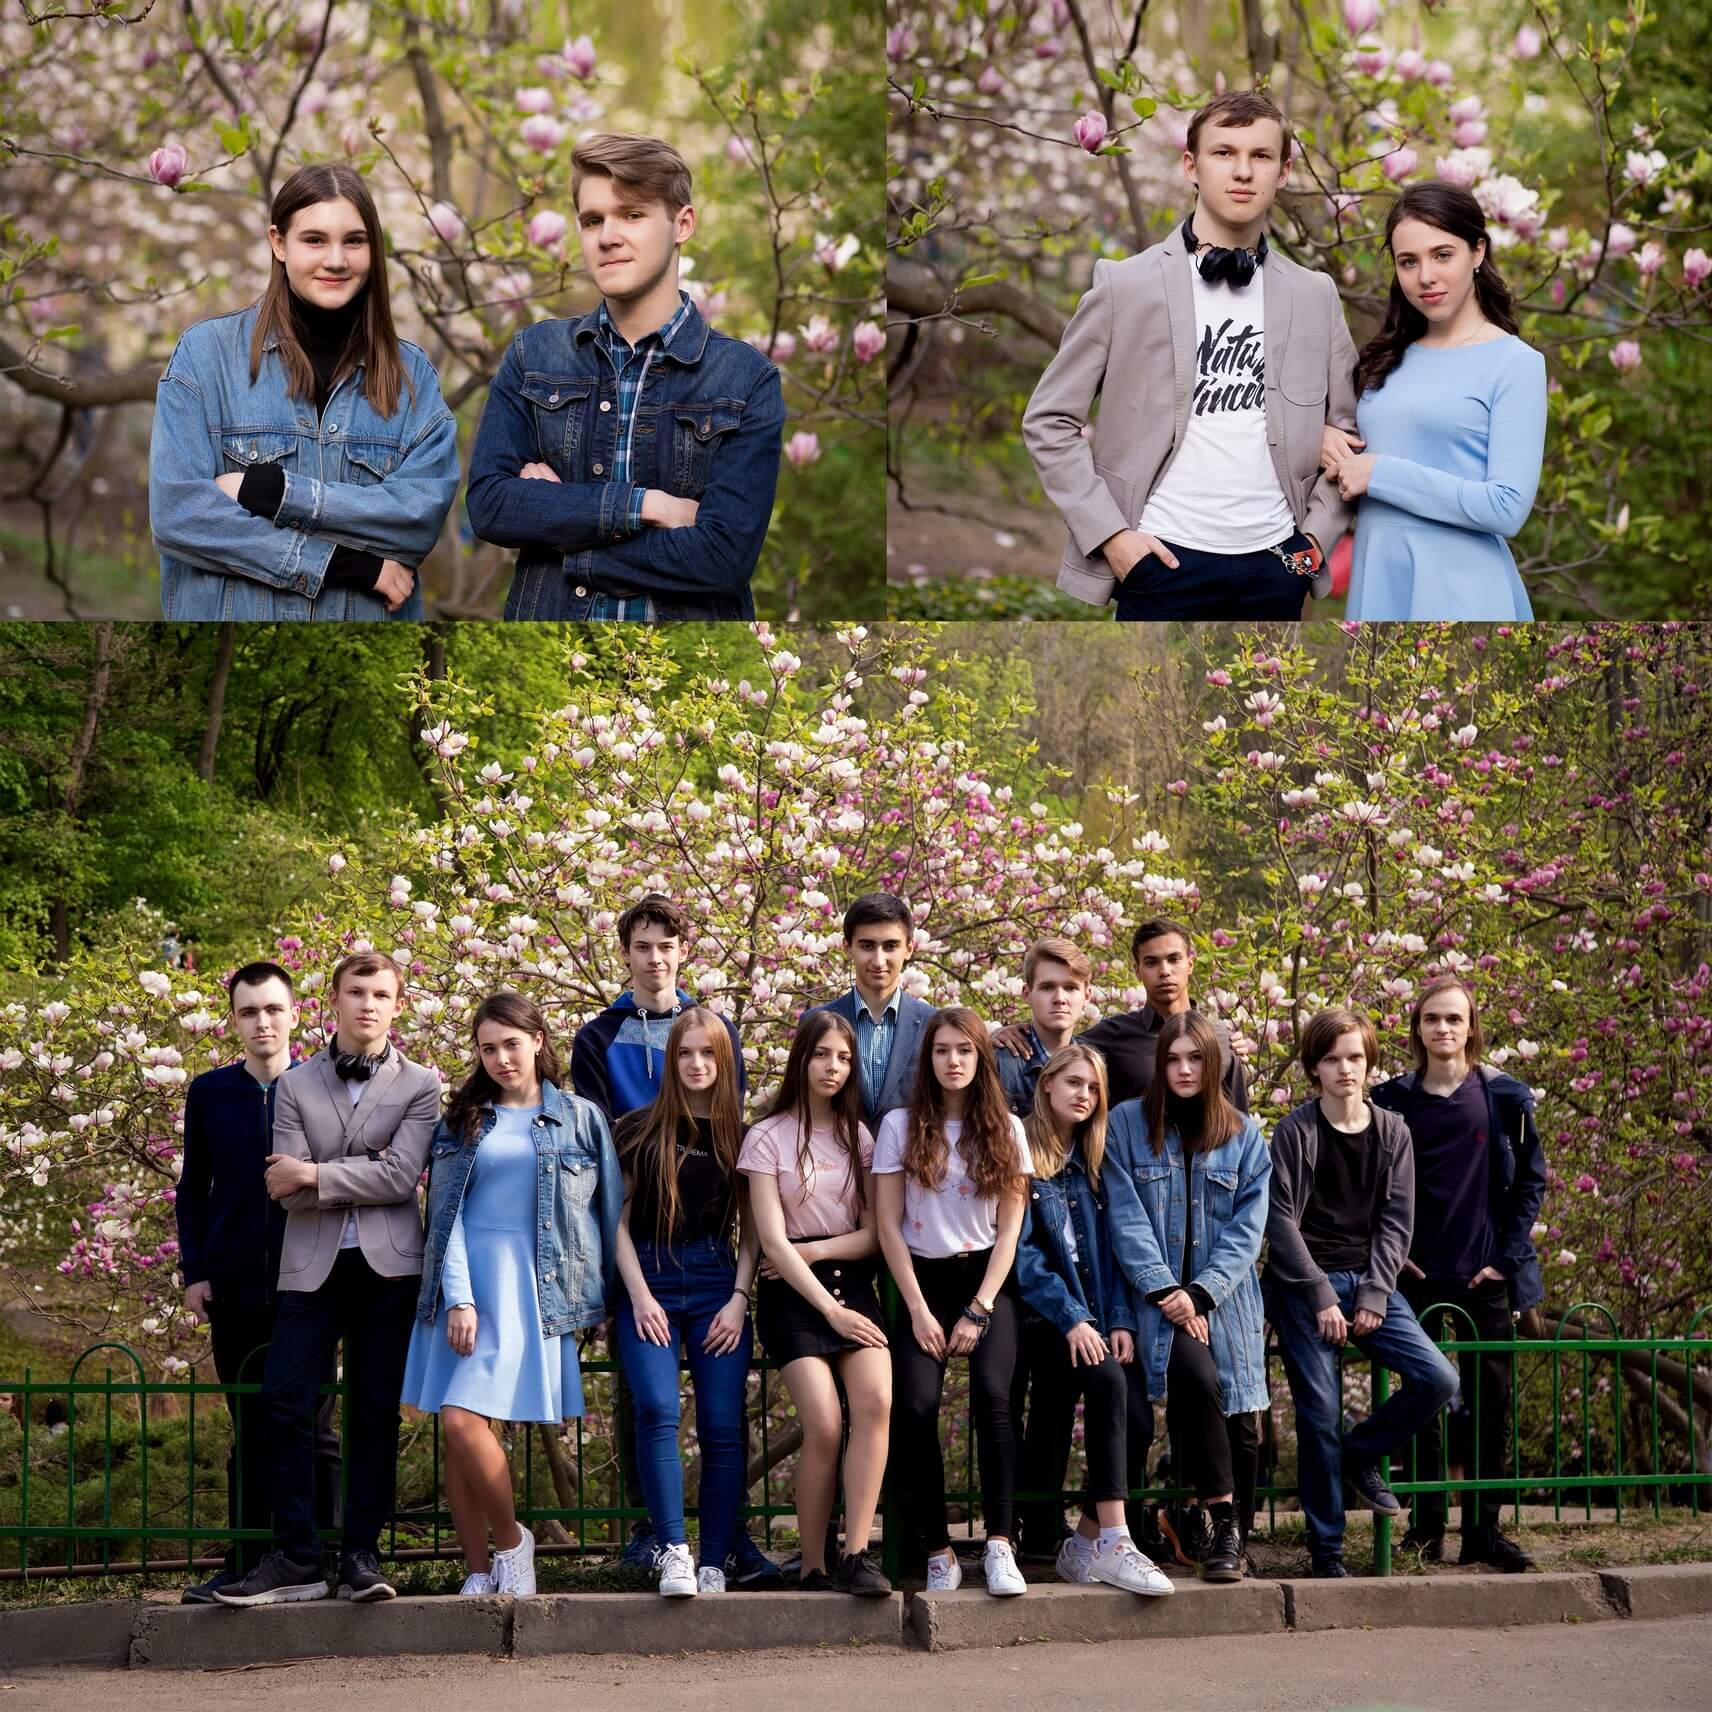 Zakazat' vypusknoj al'bom dlja 9 klassa 11 klassa Vuza shkol'nyj al'bom fotograf na vypusknoj v shkoмlu Kiev Irpen' Bucha Borshhagovka Bojarka Fastov Hotov